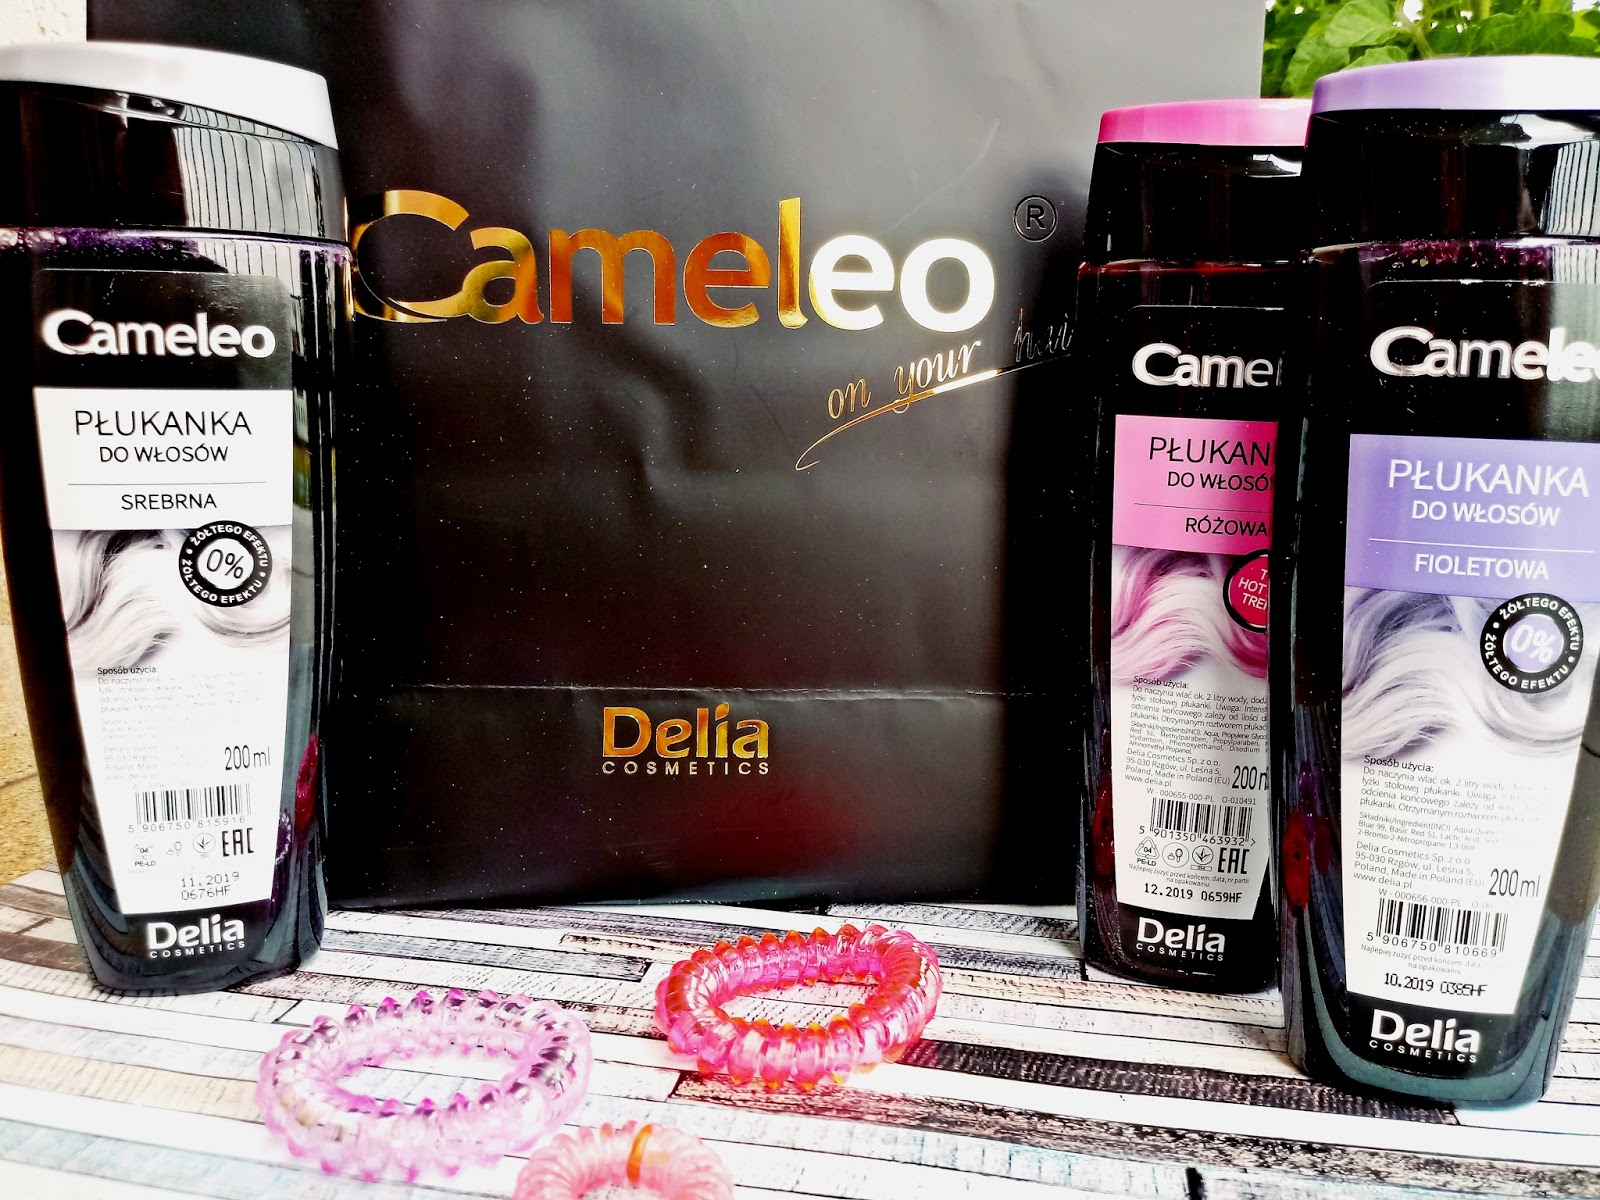 Delia Cameleo płukanka